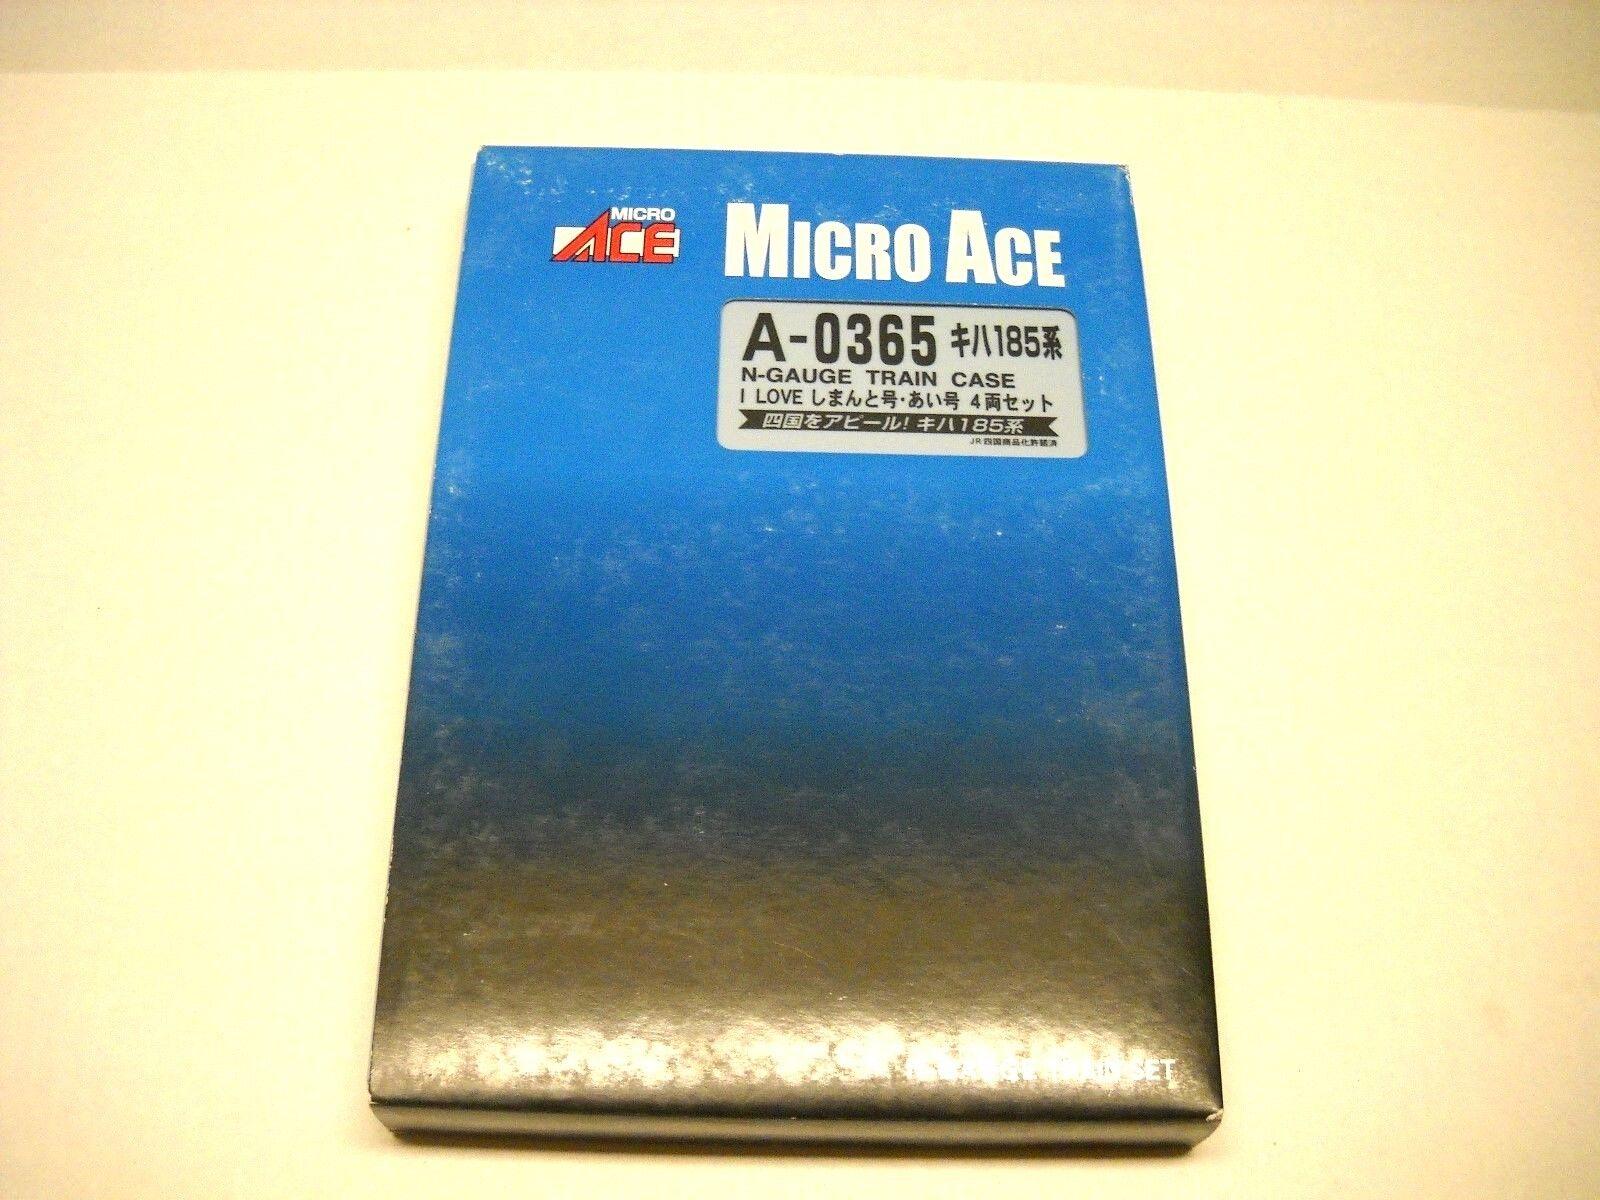 MICRO ACE COMMUTER PASSINGER TRAIN    I LOVE  A-0365